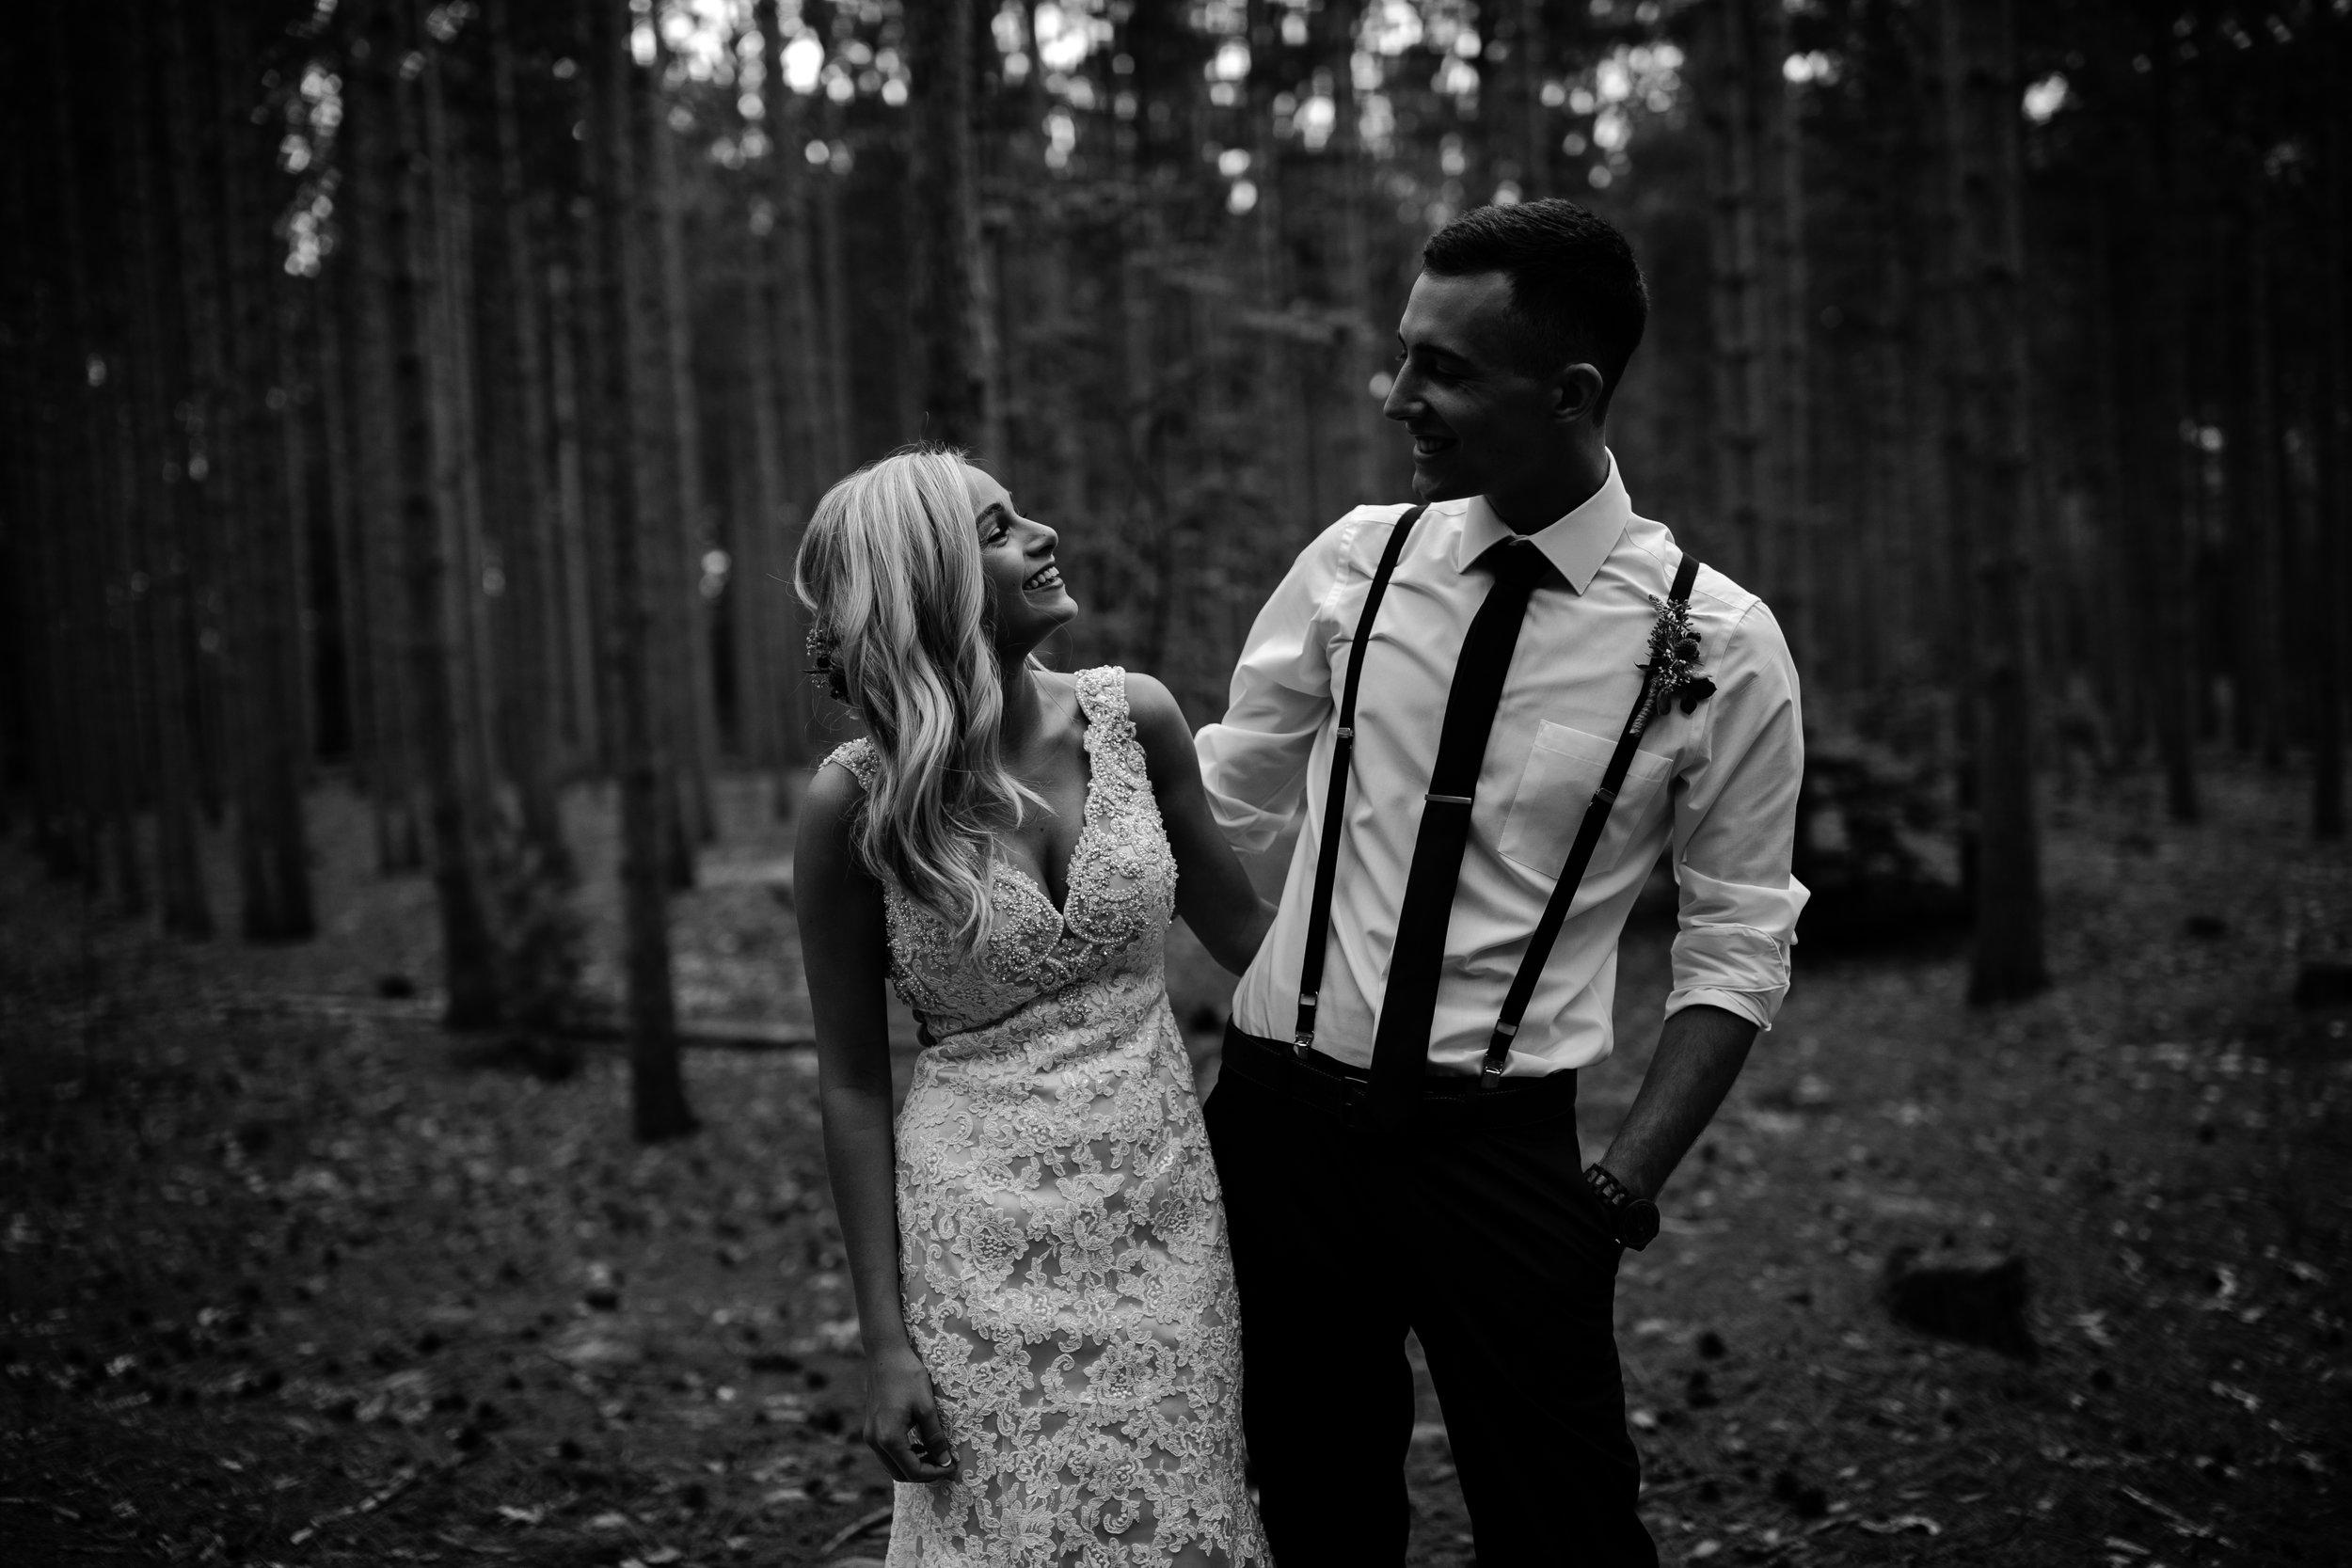 west-michigan-wedding-photographer-whitehall-rachel-austin-chapel-in-the-pines-561.jpg